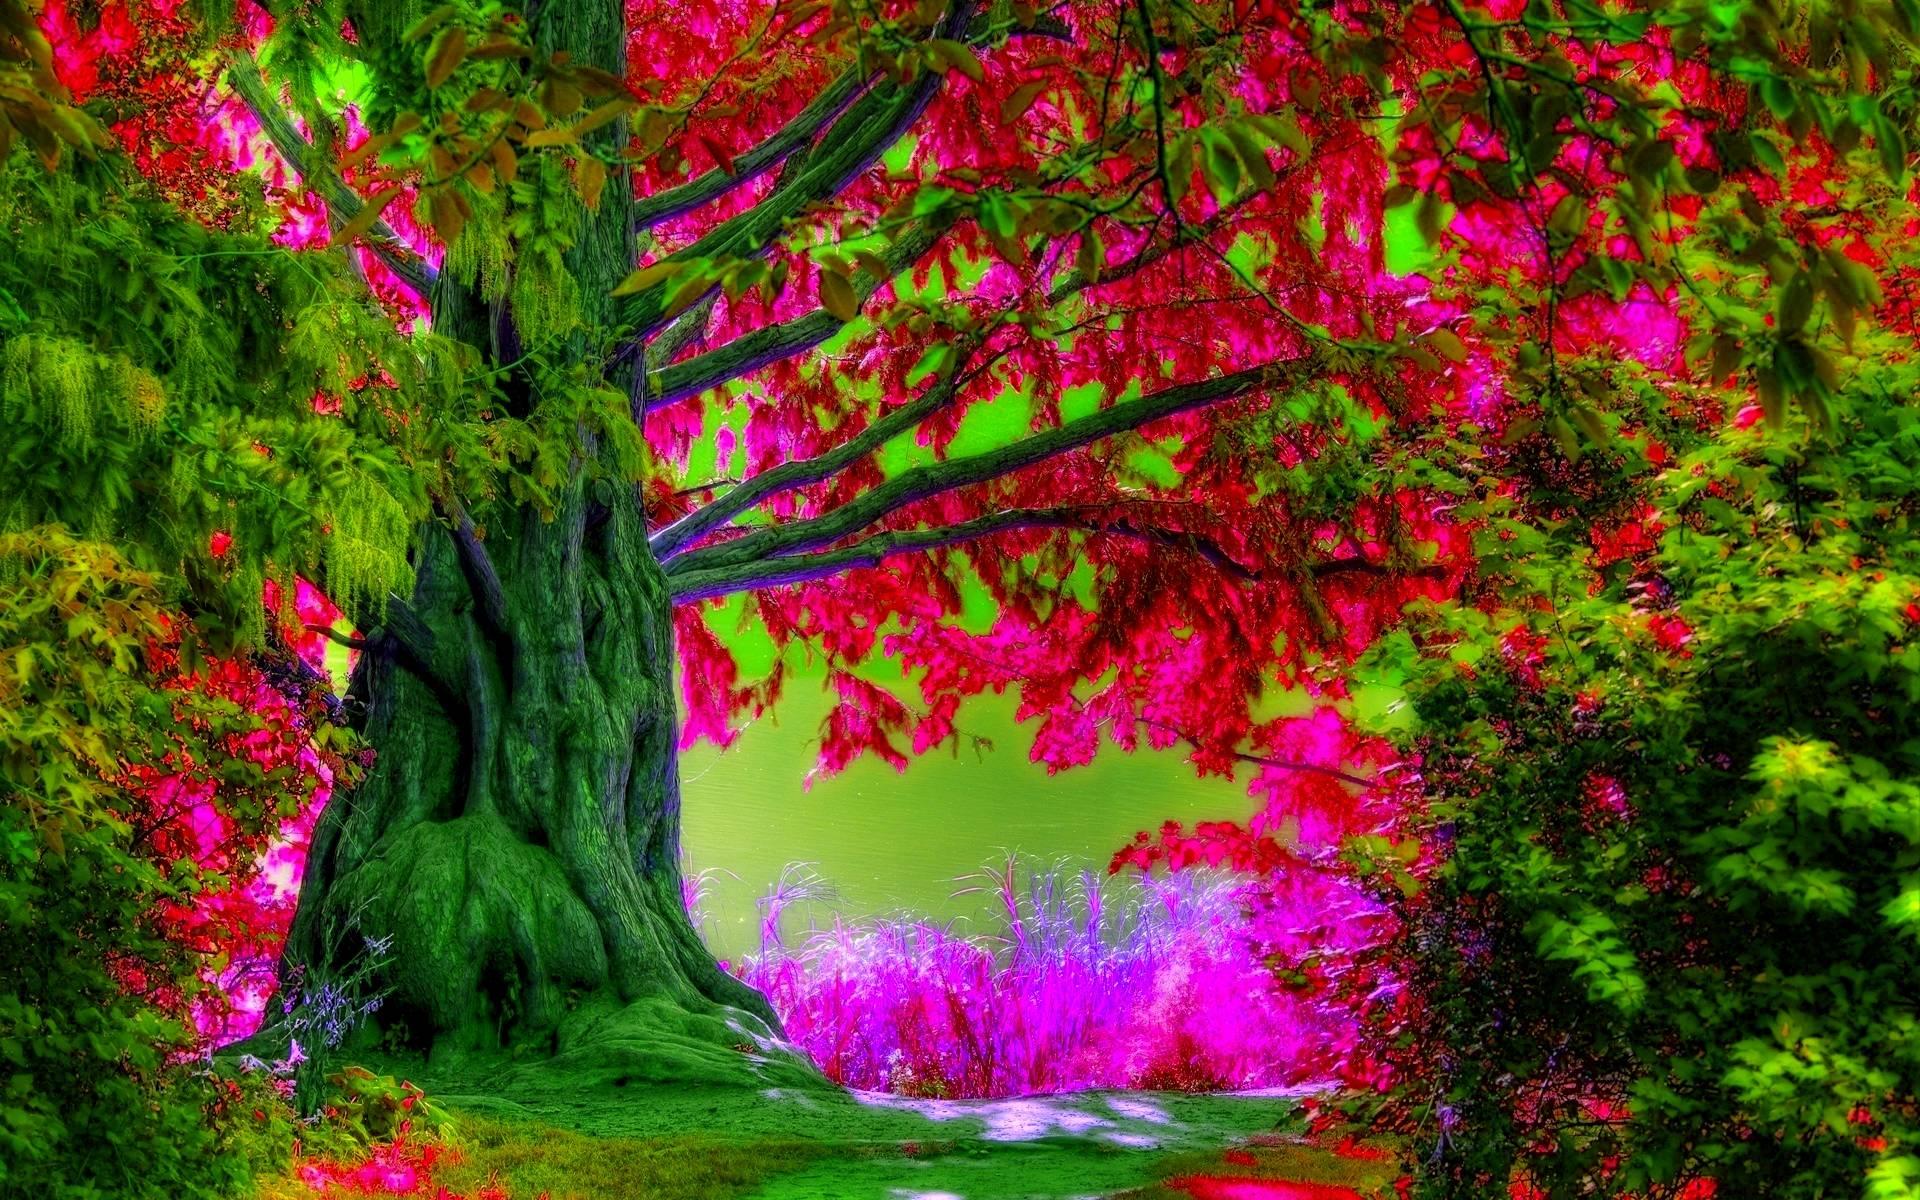 Spring Backgrounds Pictures For Desktop 1920x1200